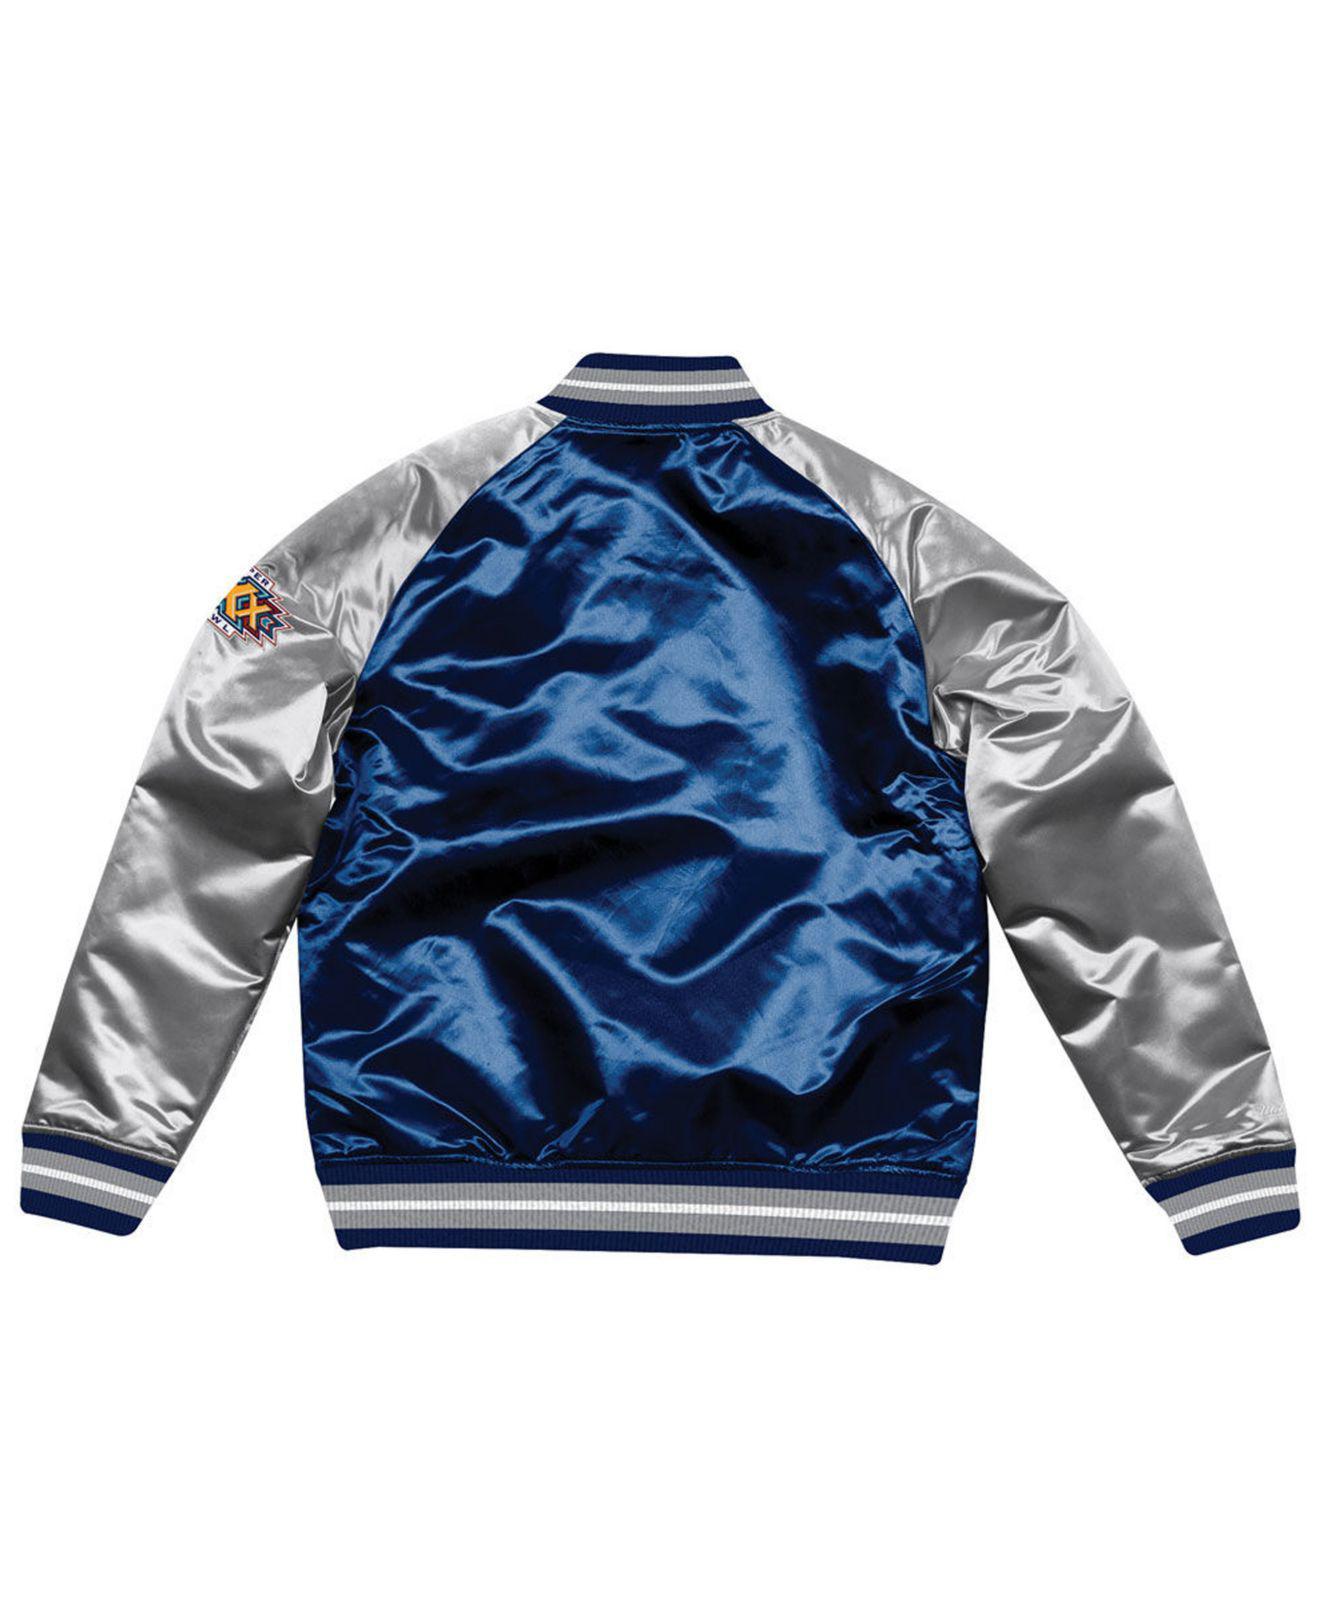 detailed look 19dd1 8a167 Men's Blue Dallas Cowboys Tough Season Satin Jacket